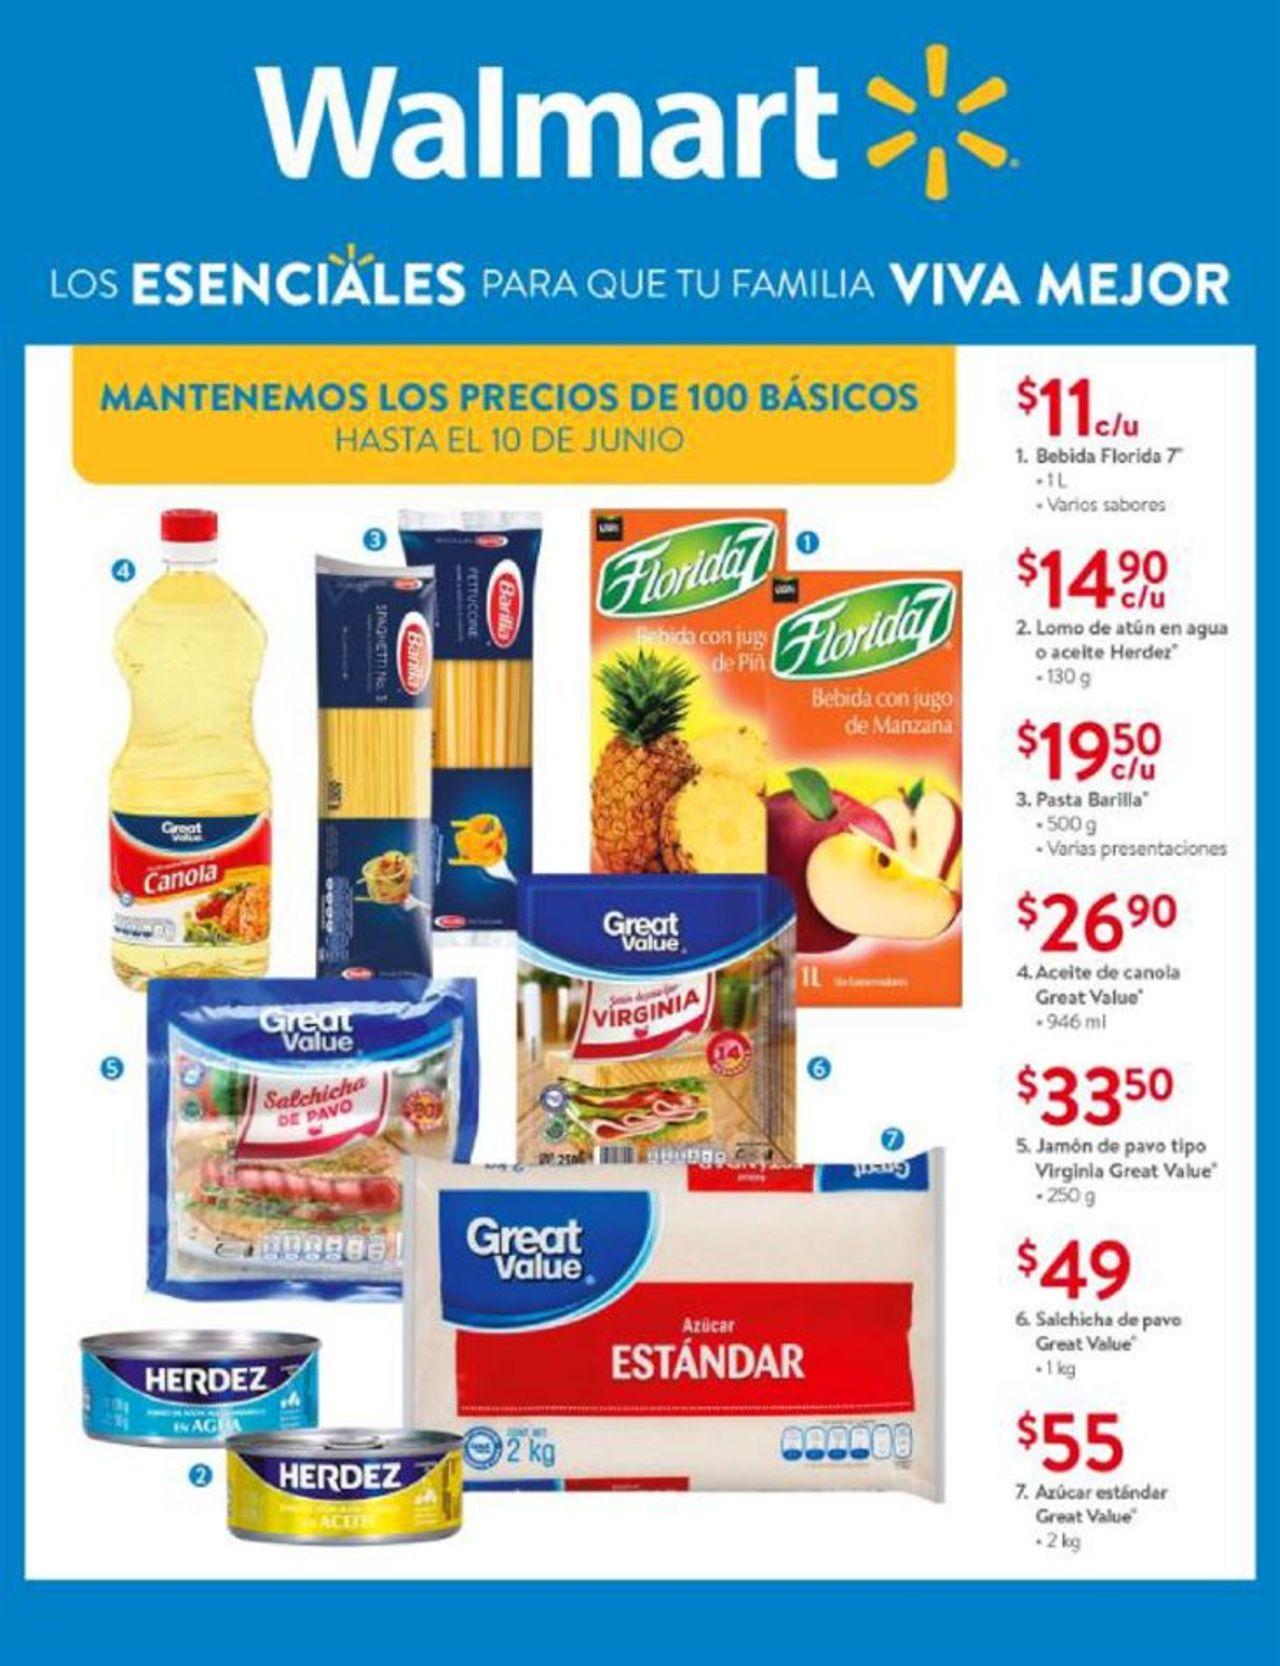 Walmart Folleto - 02.06-16.06.2020